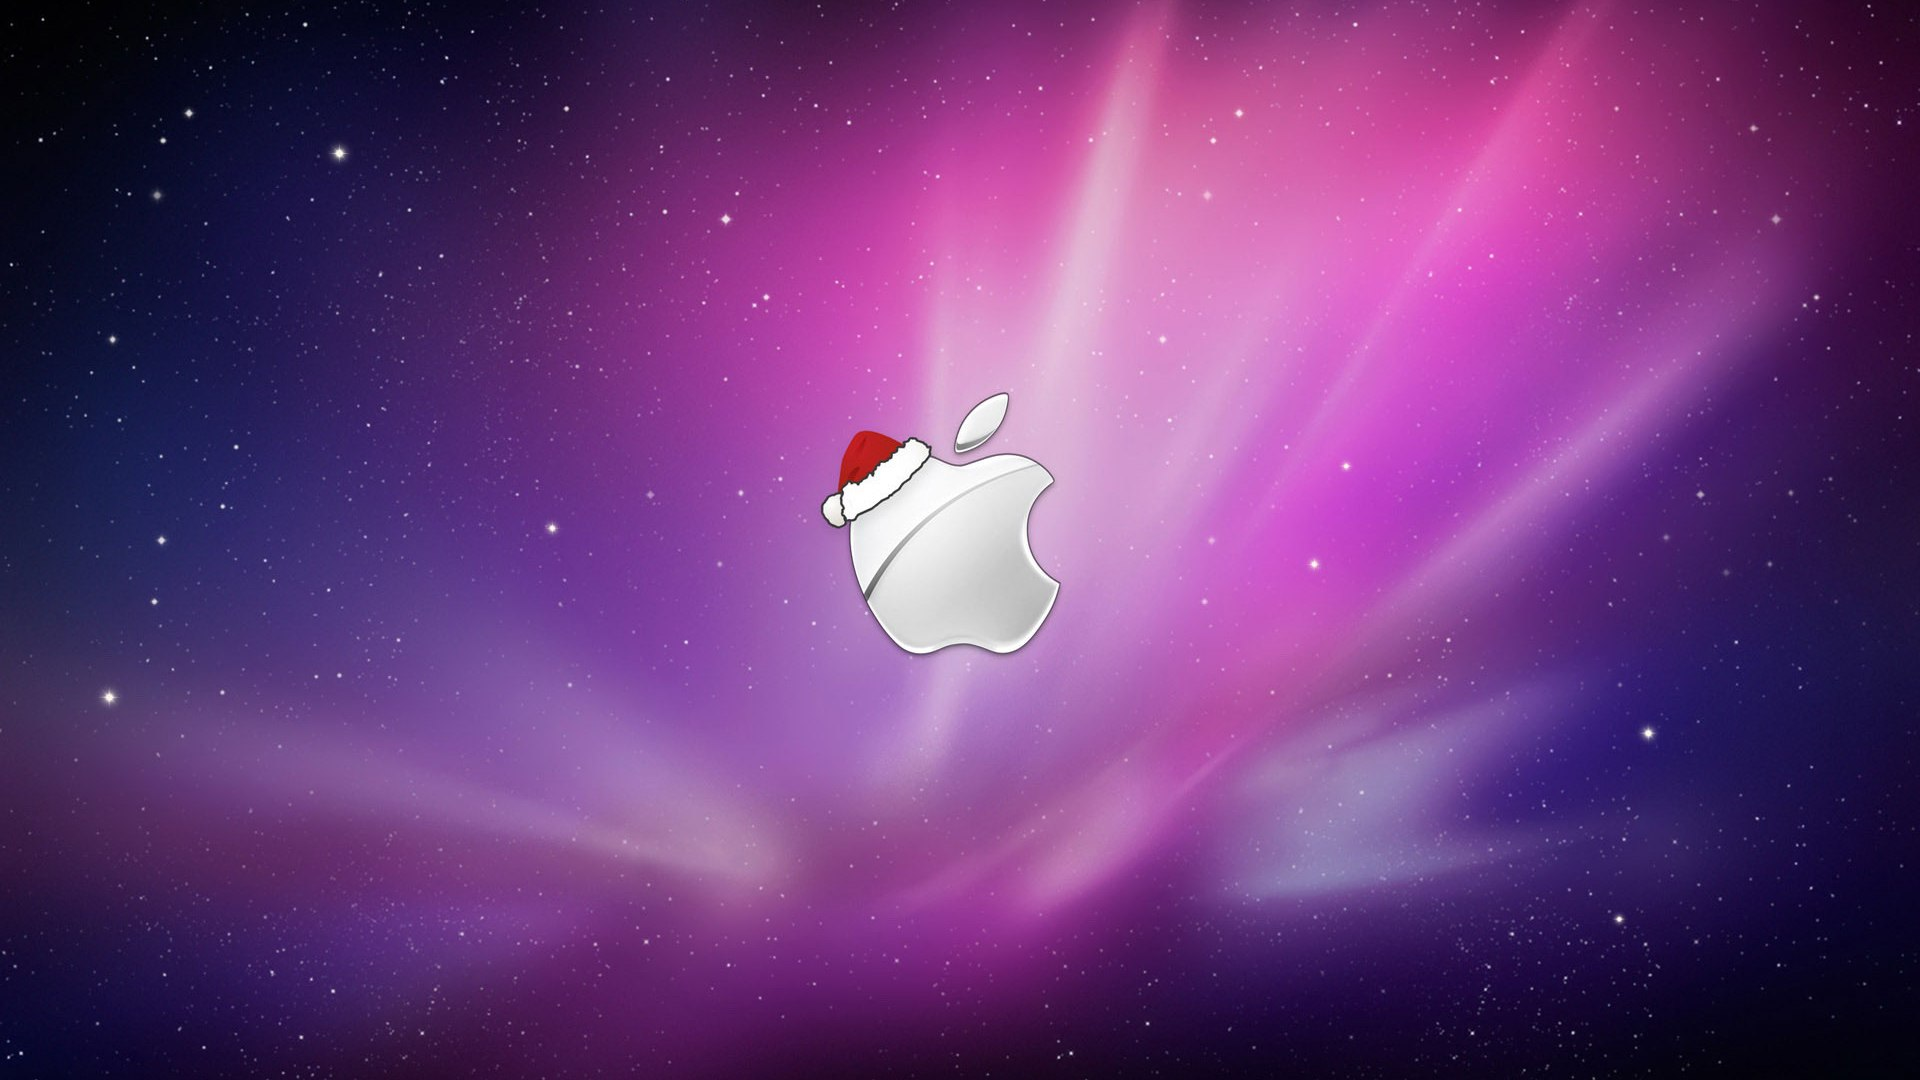 Apple Новый Год